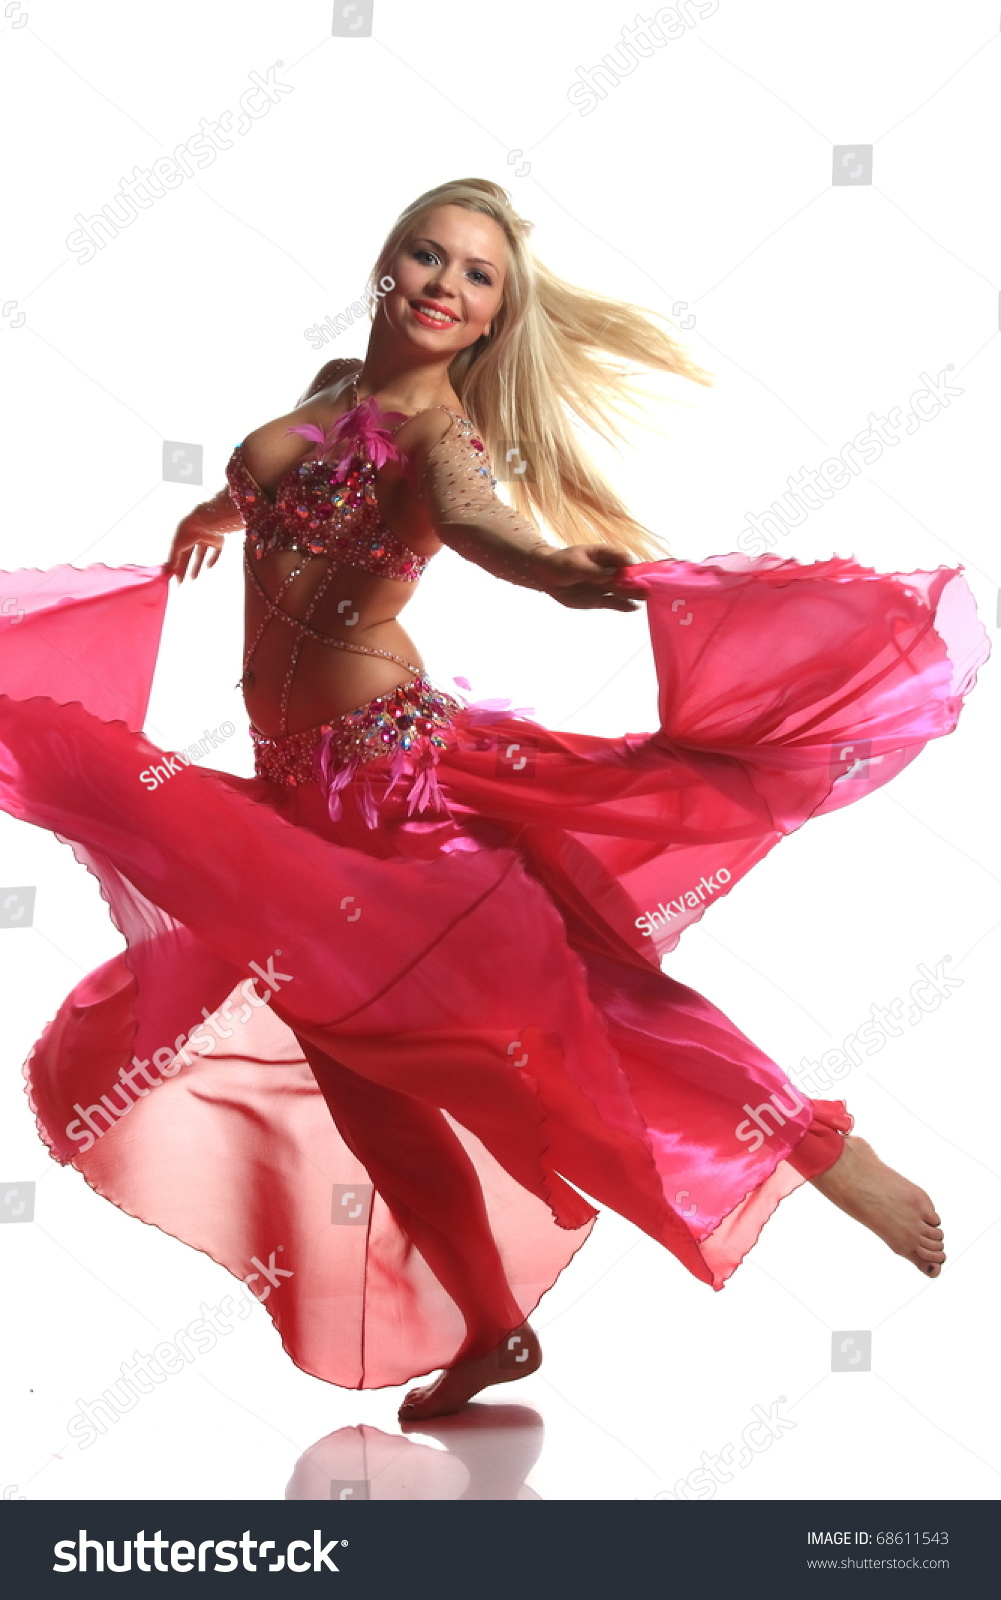 64b6b9f666c59 Beautiful Blonde Active Arab Dance Stock Photo (Edit Now) 68611543 ...